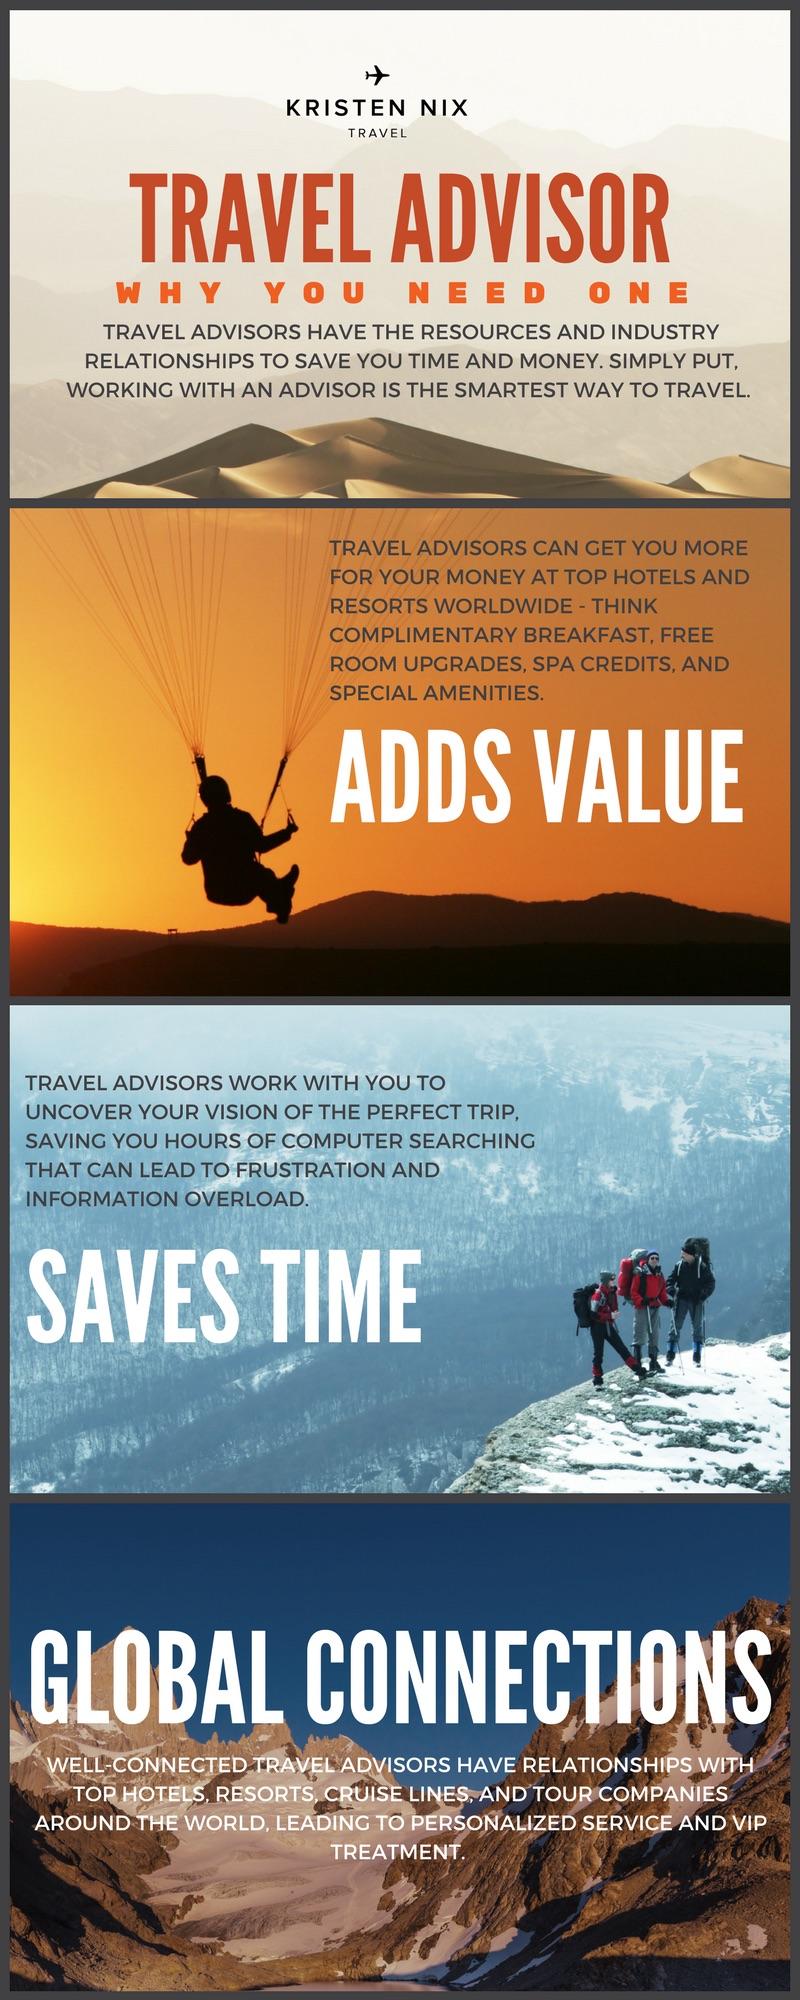 Why You Need a Travel Advisor